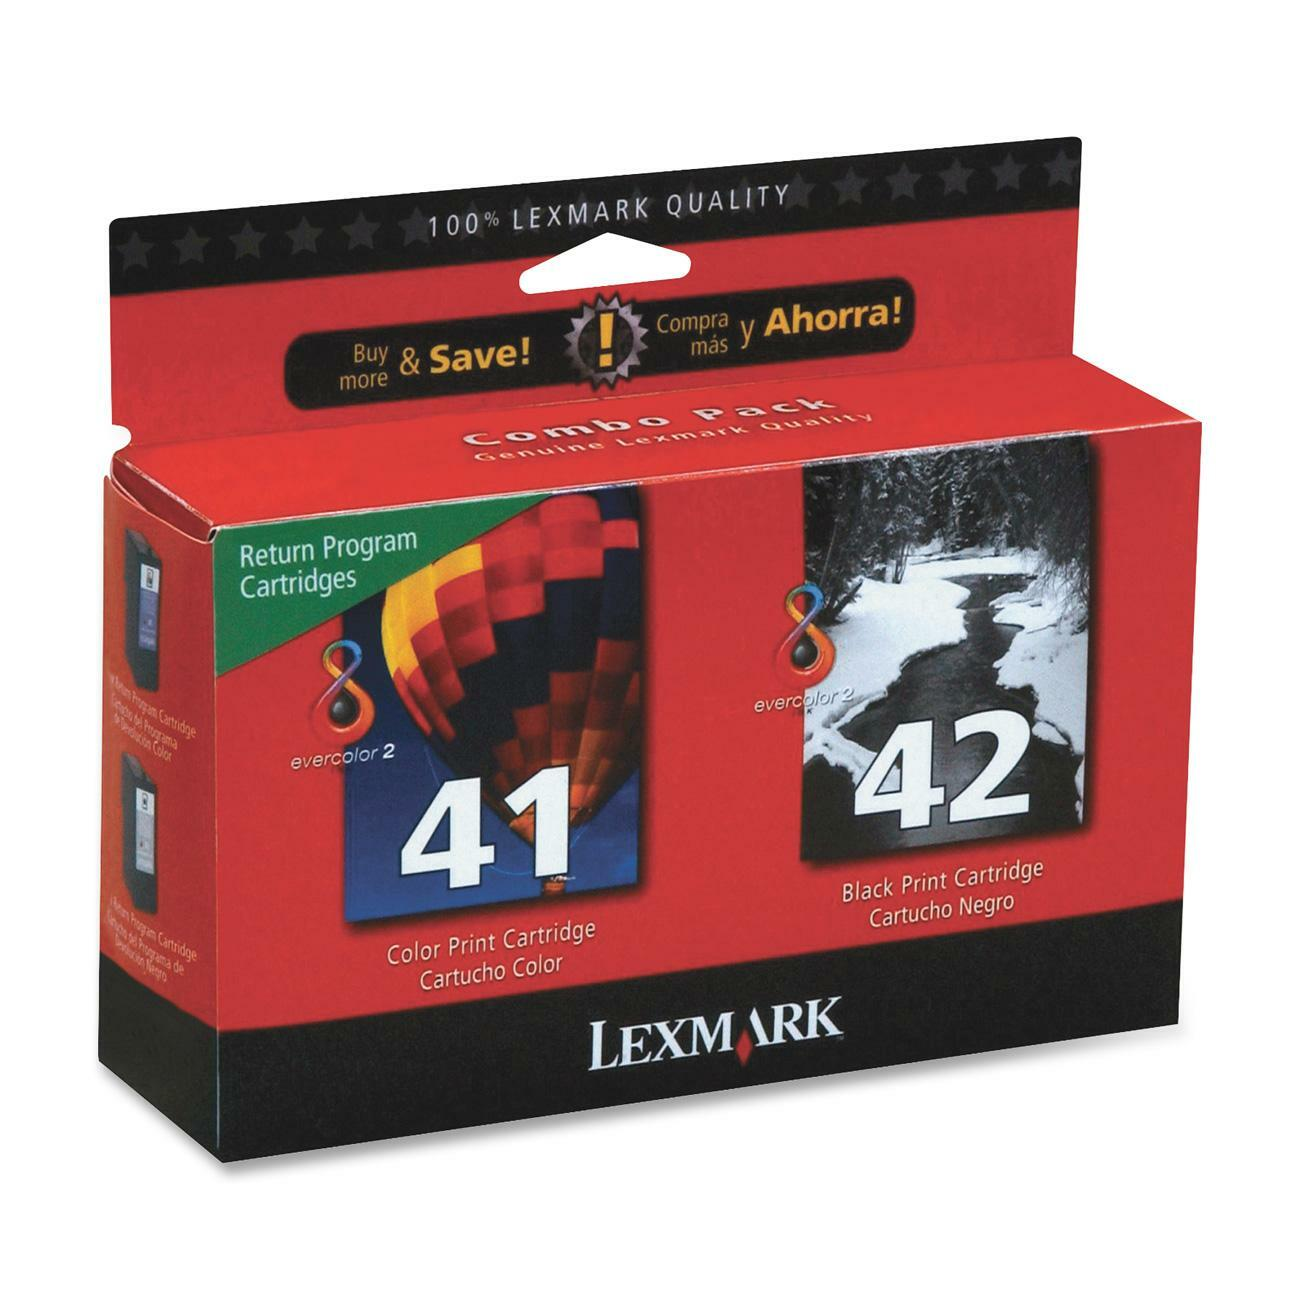 lexmark z735 treiber